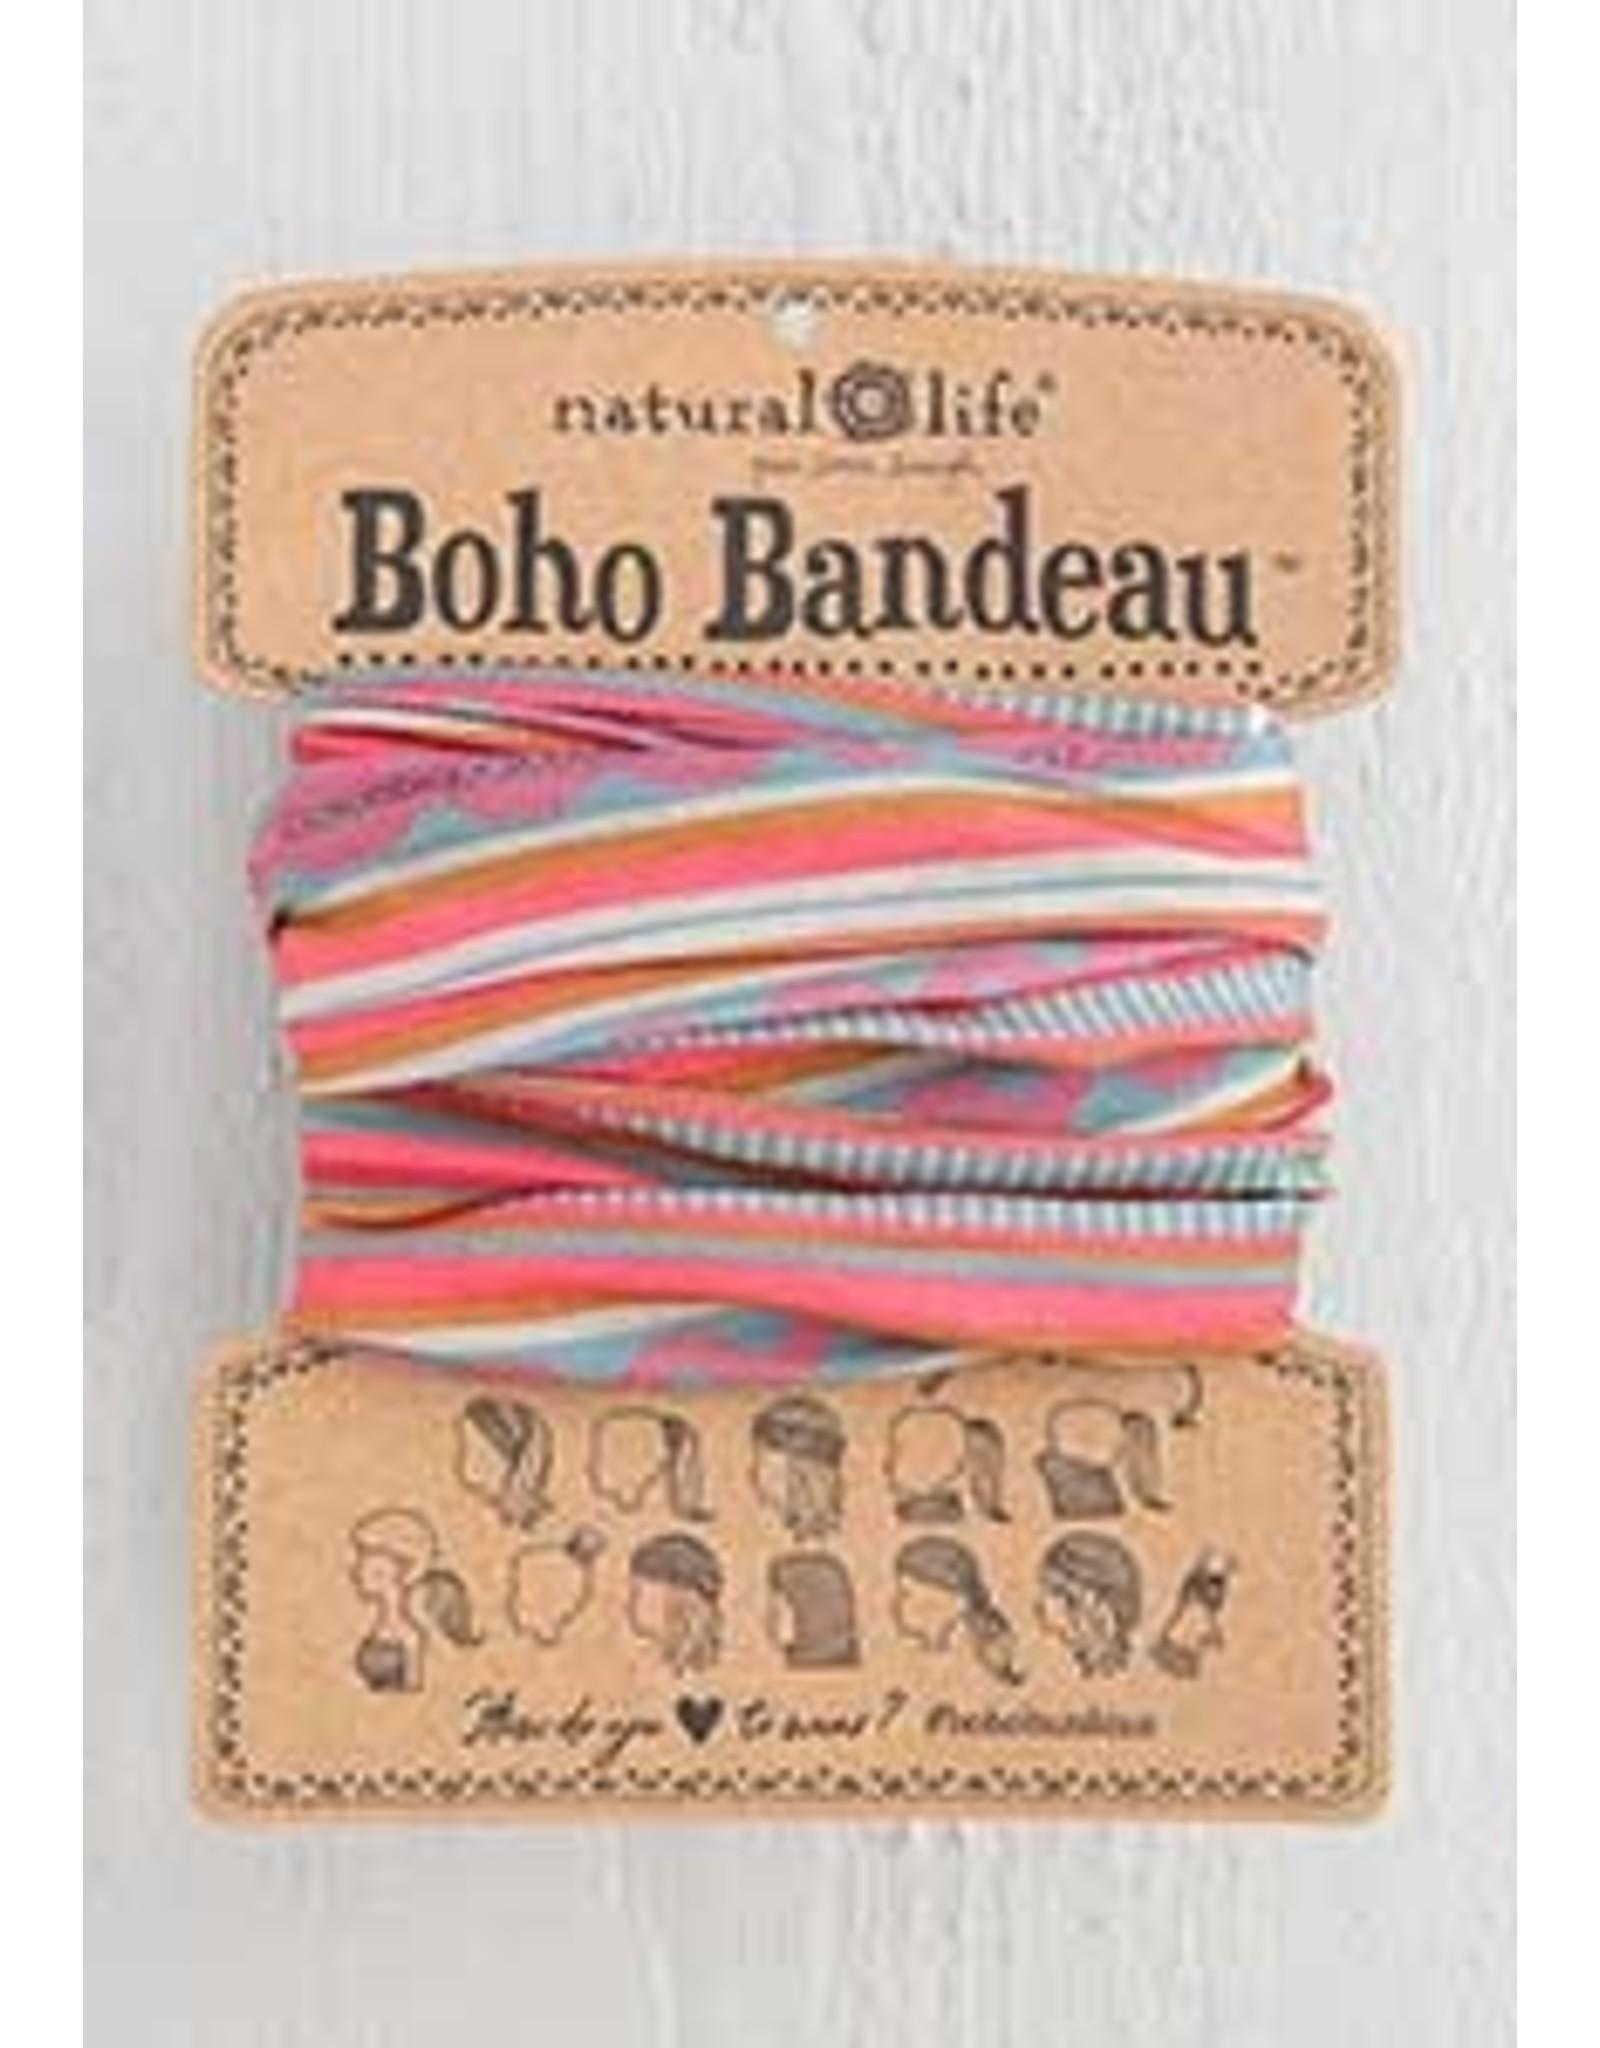 Natural LIfe Boho Bandeau, Coral Sand Aqua Stripe